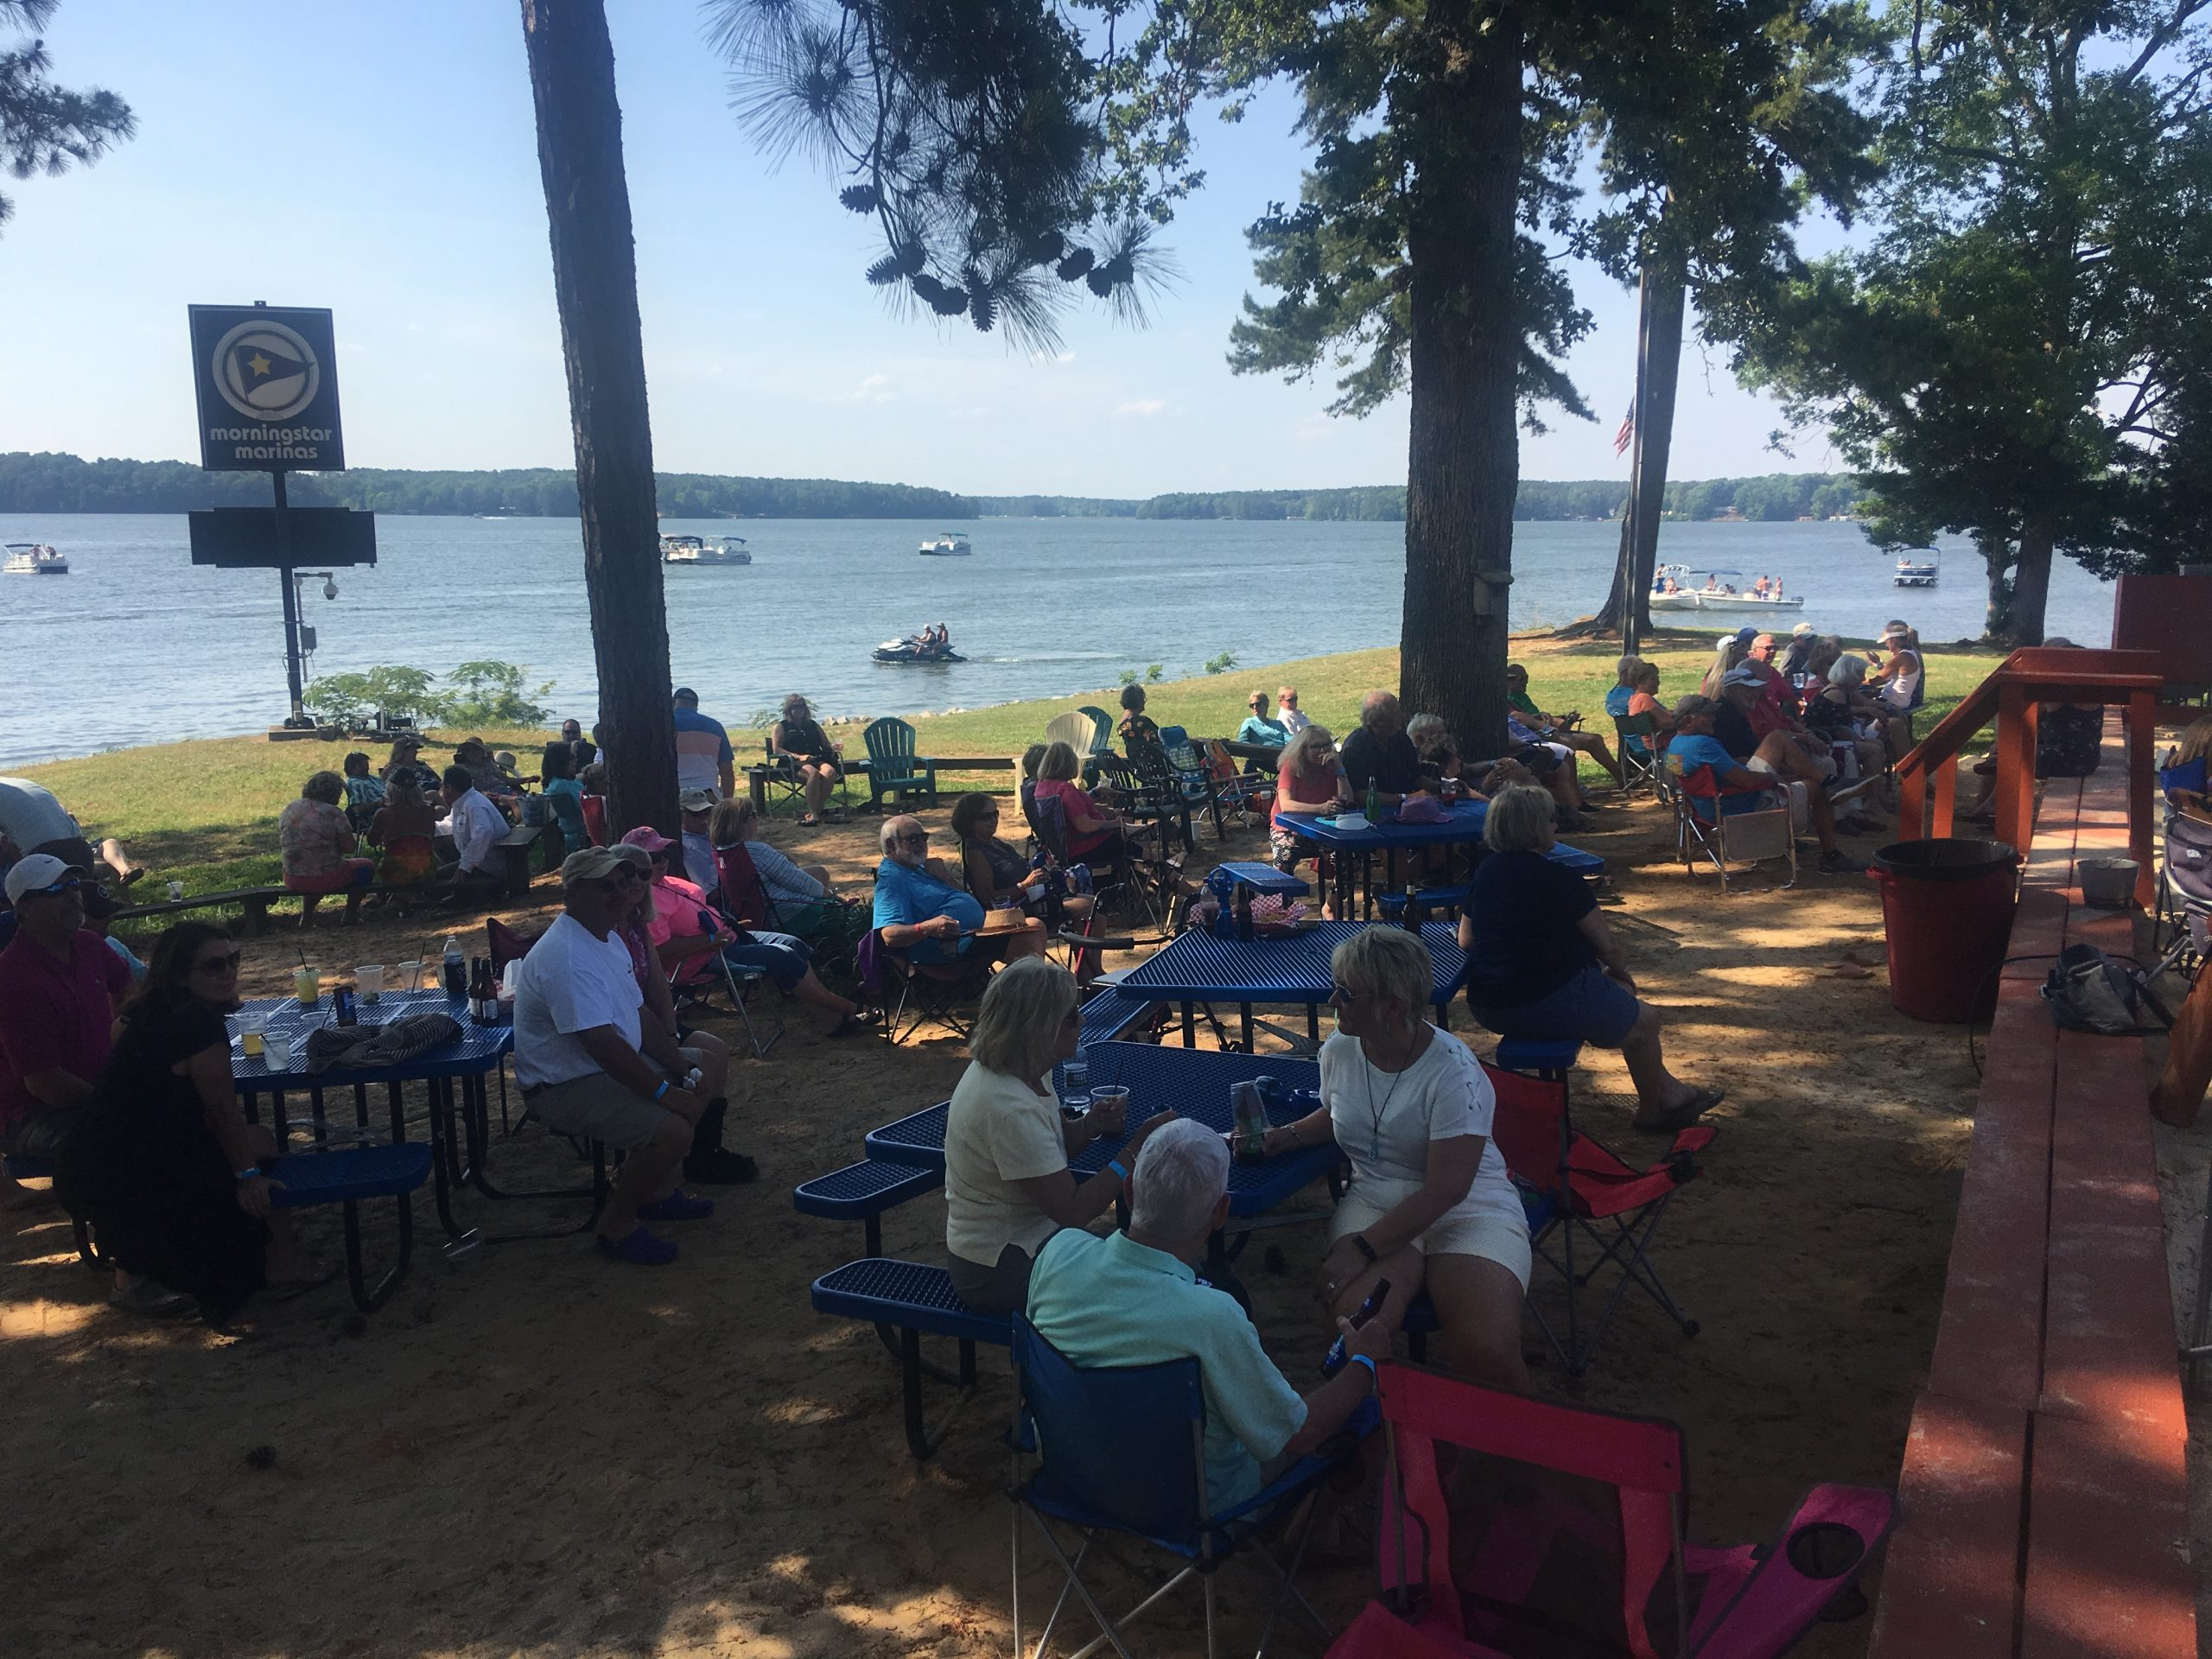 outdoor event at Eaton Ferry Marina on lake Gaston